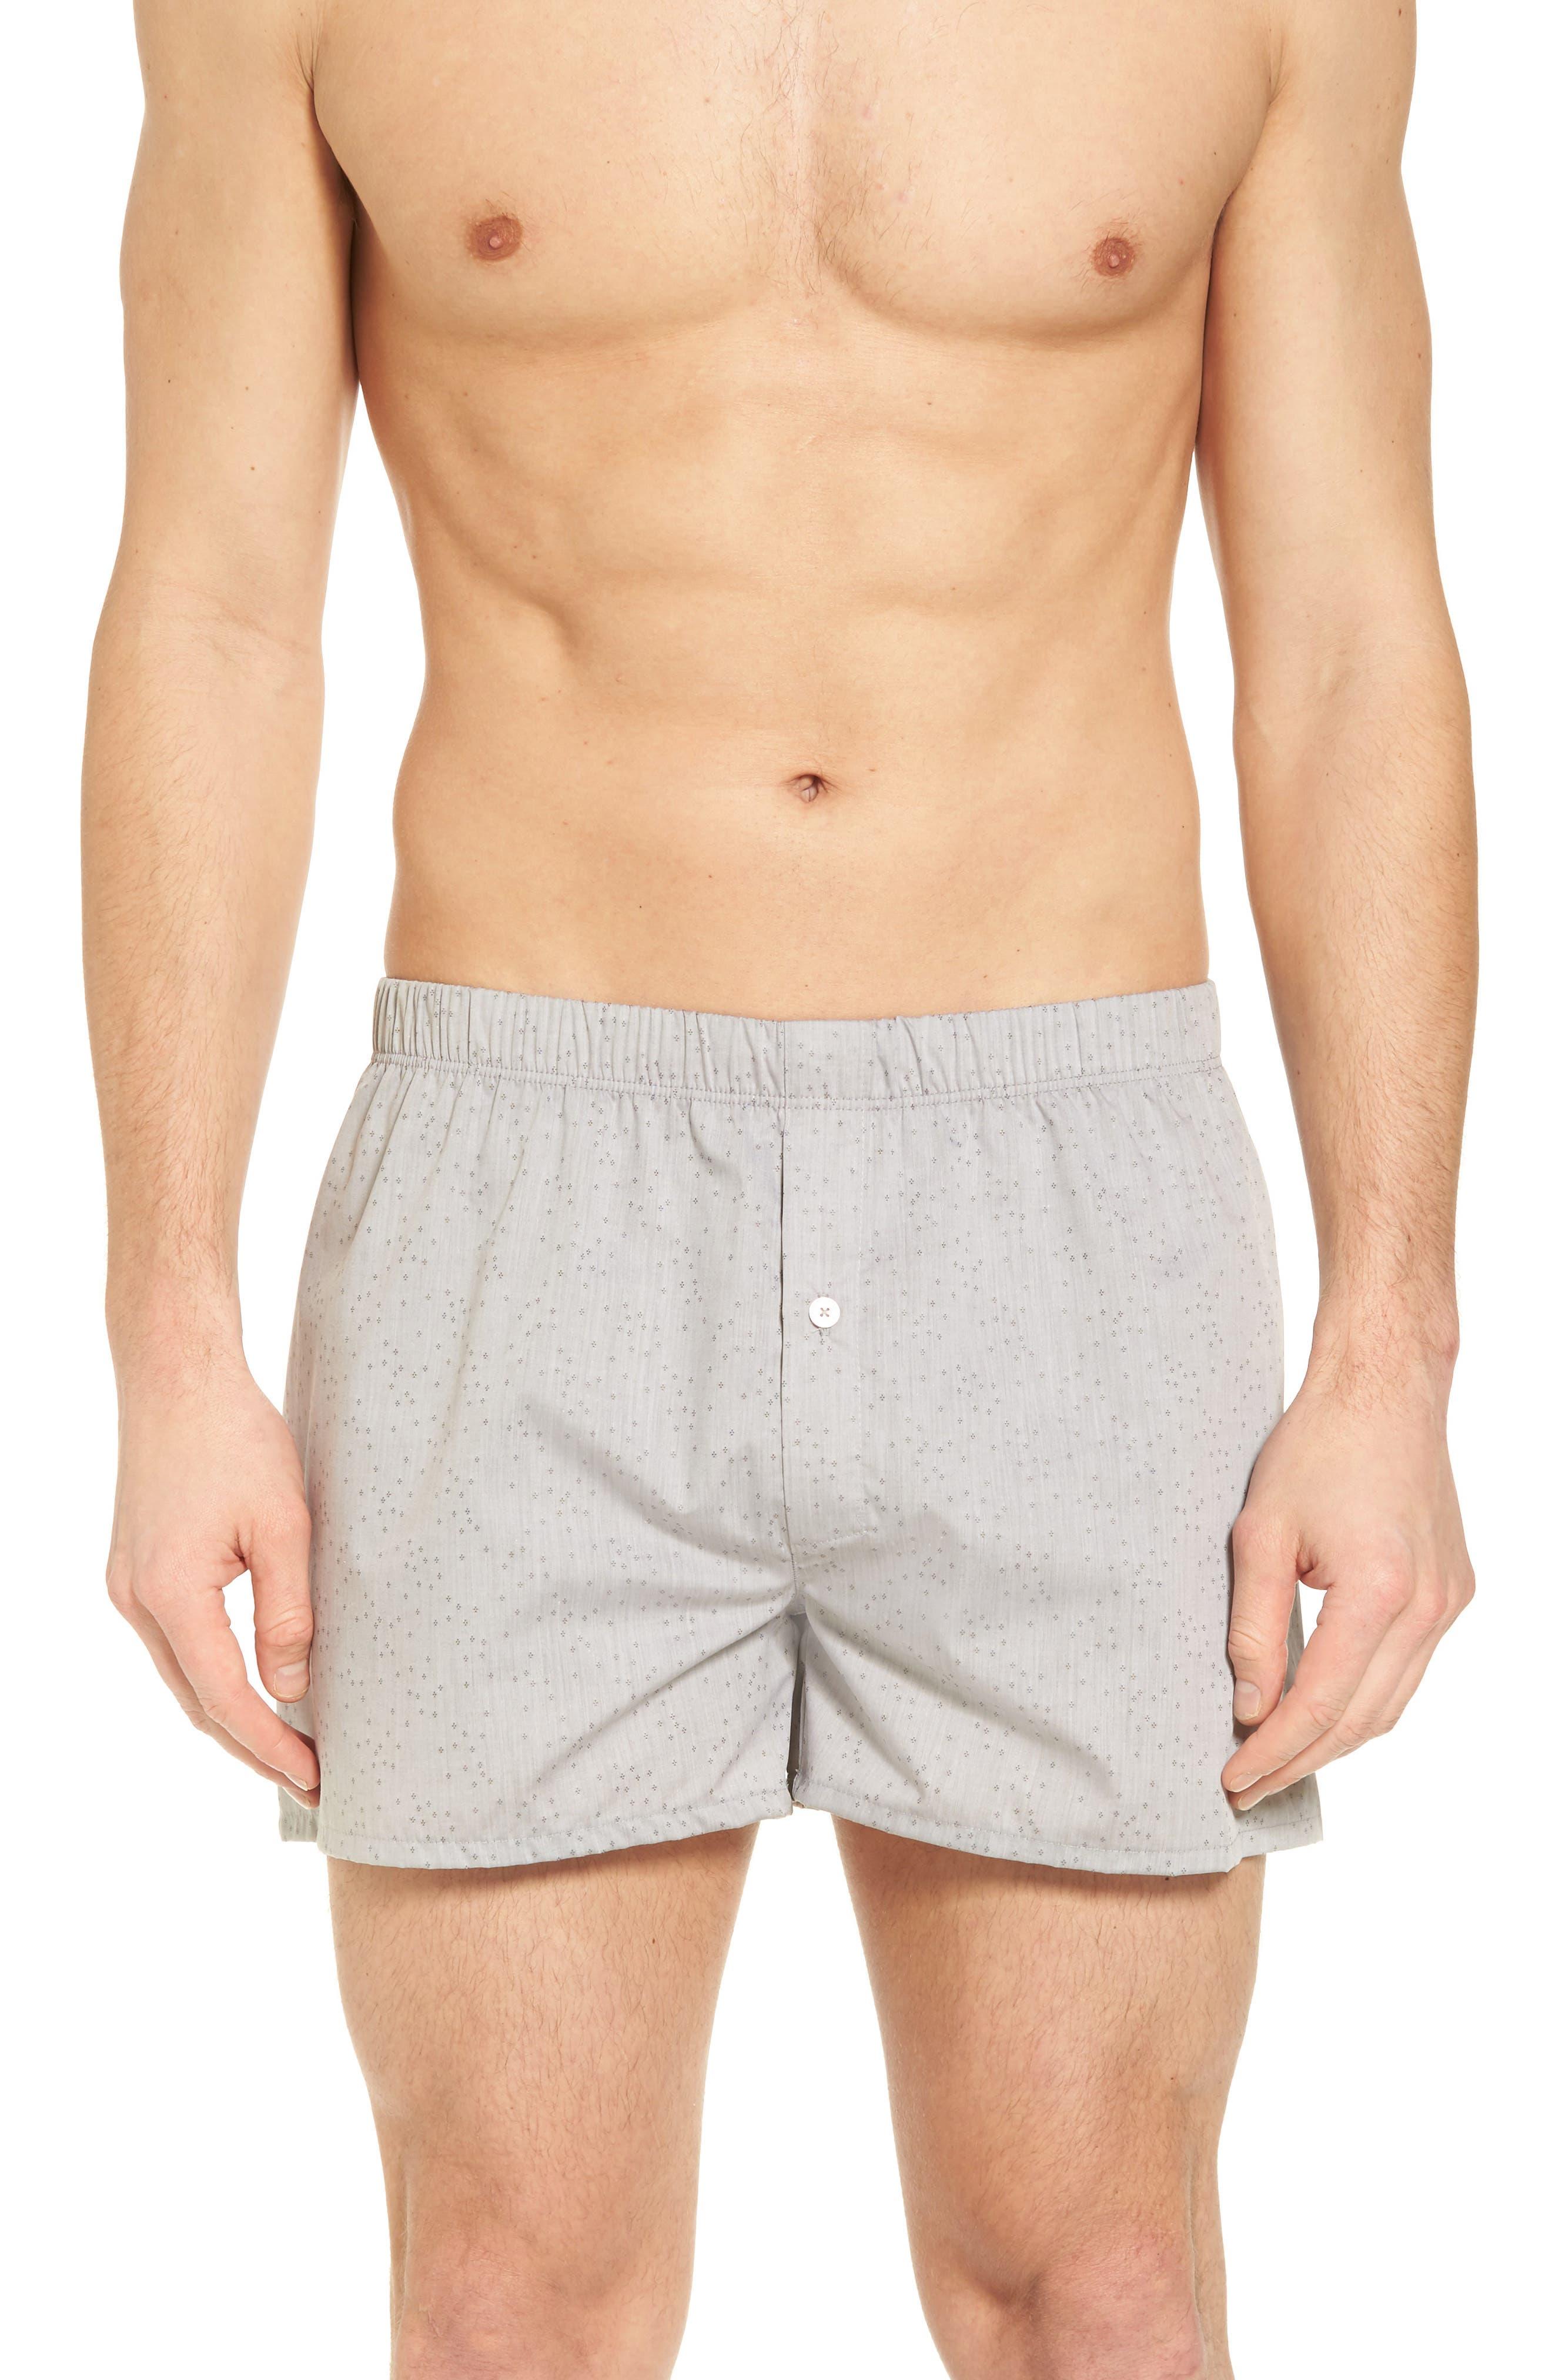 HANRO Fancy Cotton Boxers, Main, color, MINIMAL STRUCTURE